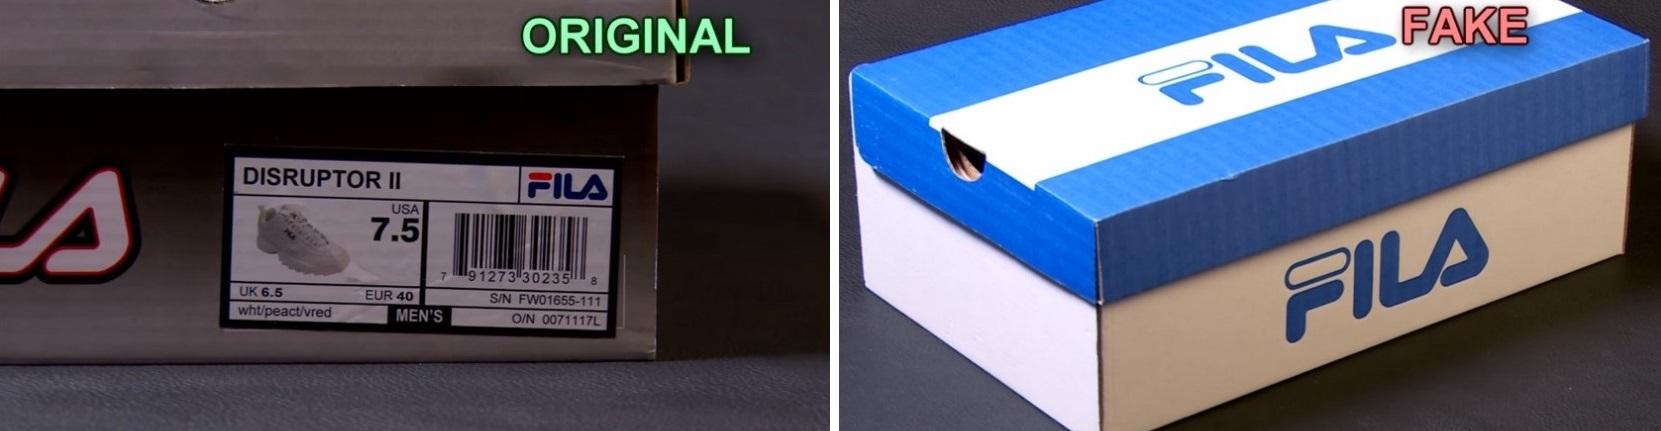 Наклейка на оригинале и фейк Fila Disruptor